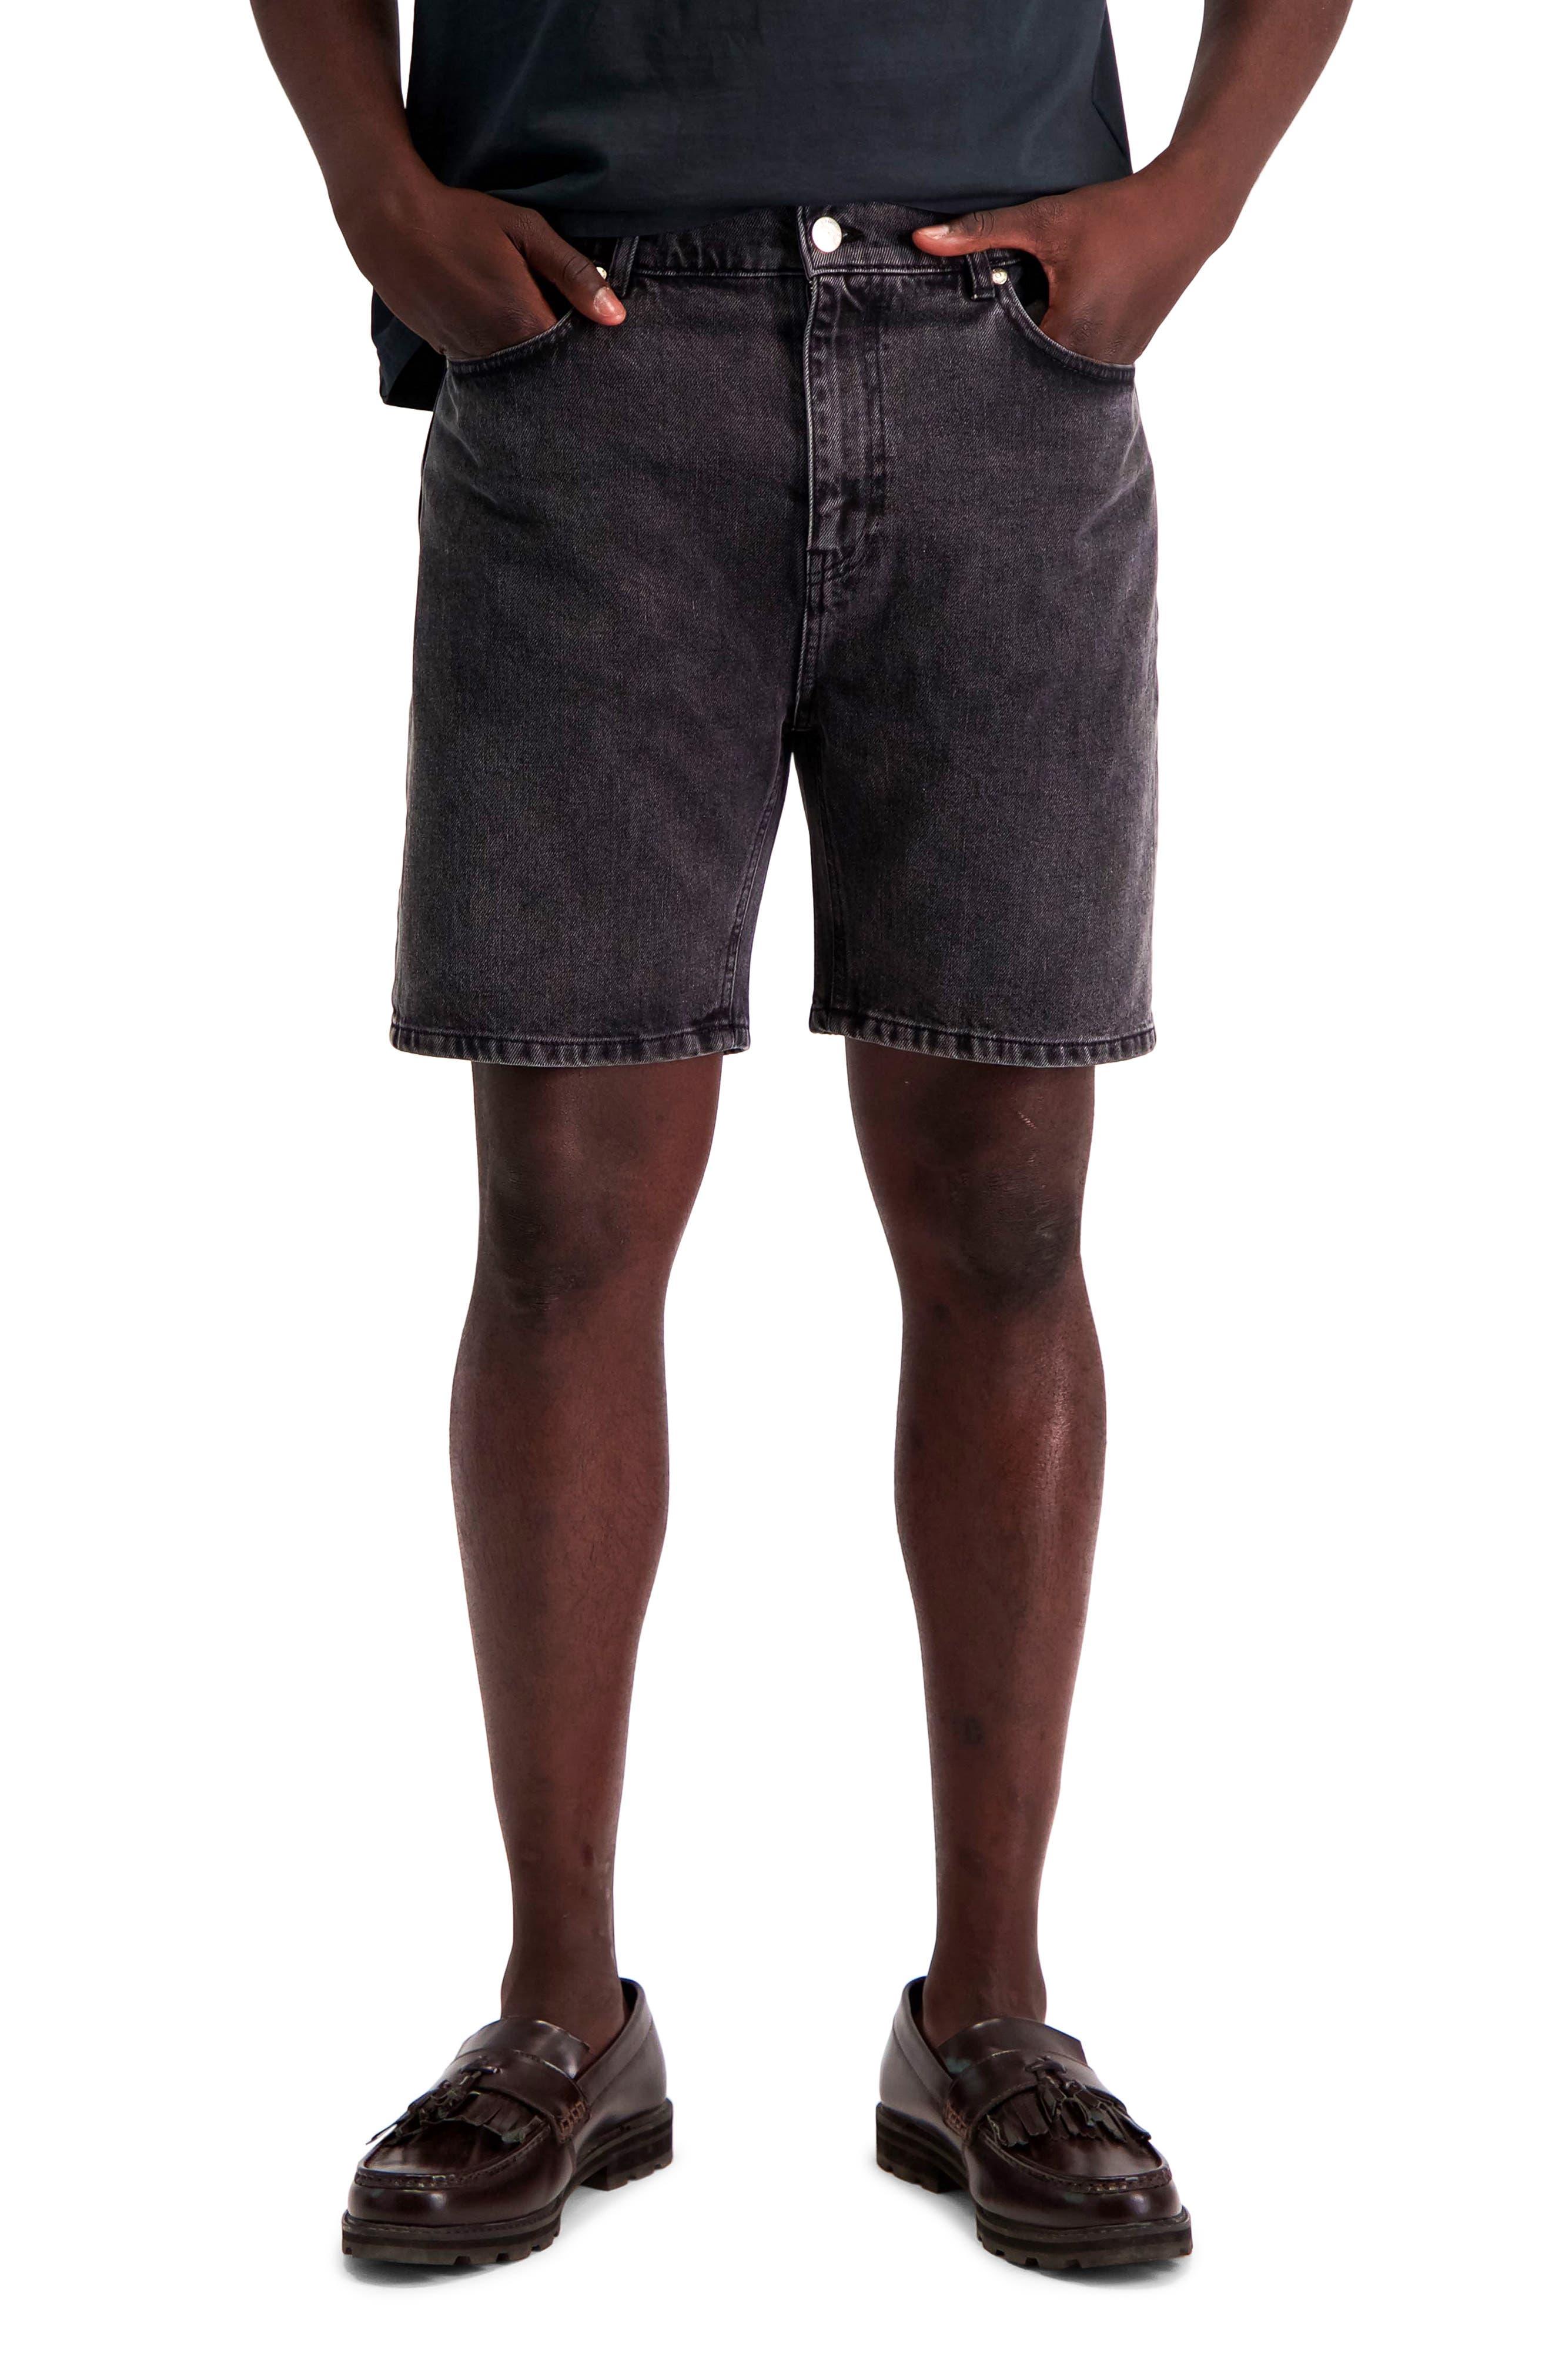 Ted Regular Fit Denim Shorts